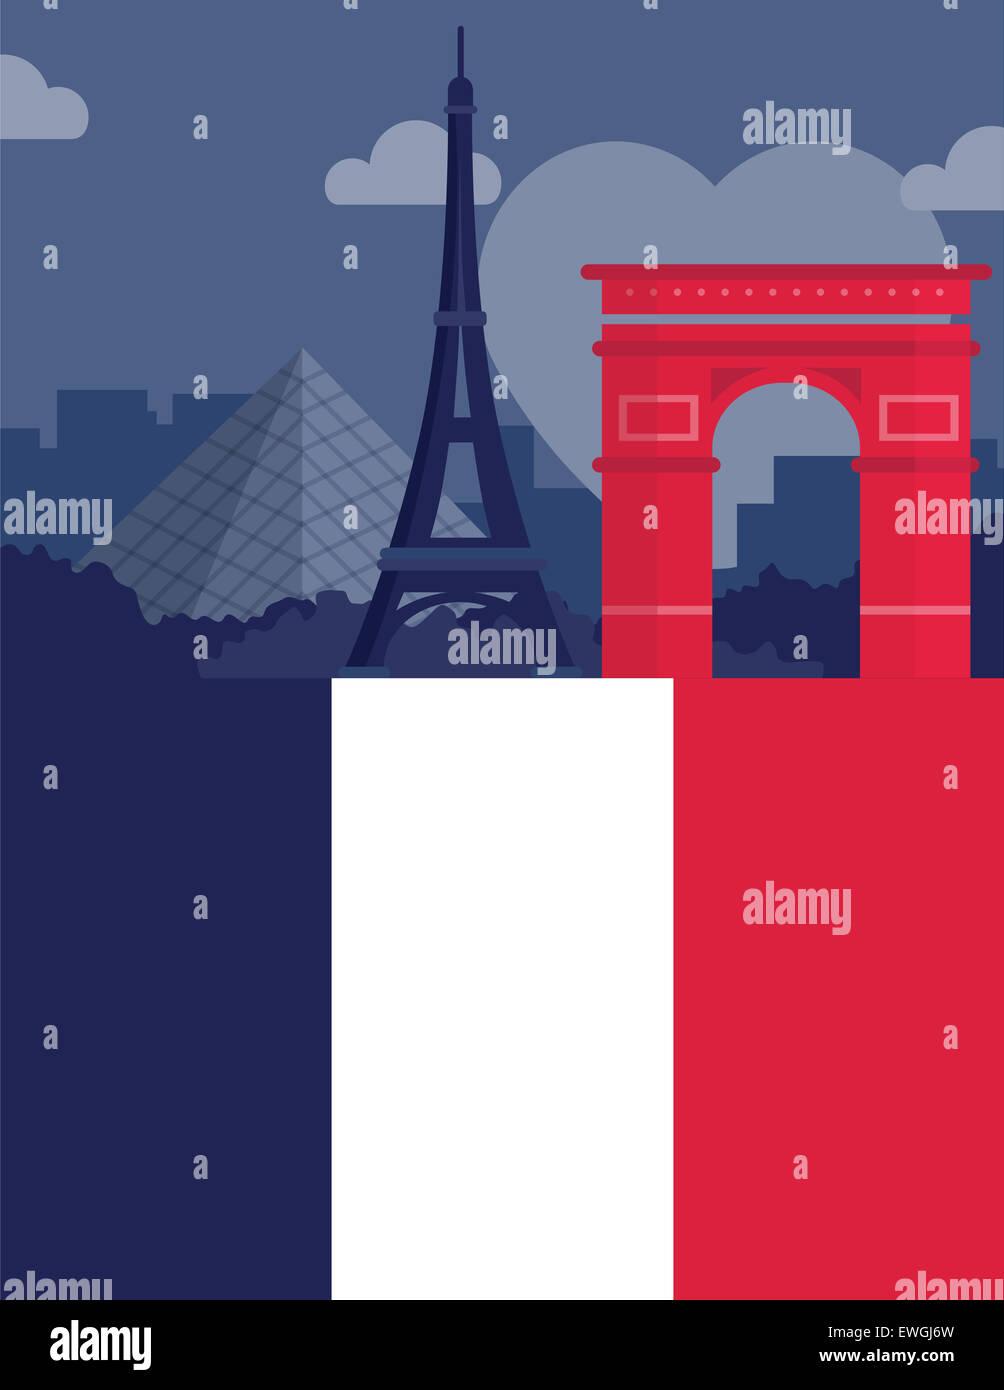 Illustrative image representing famous landmarks of Paris, France Stock Photo